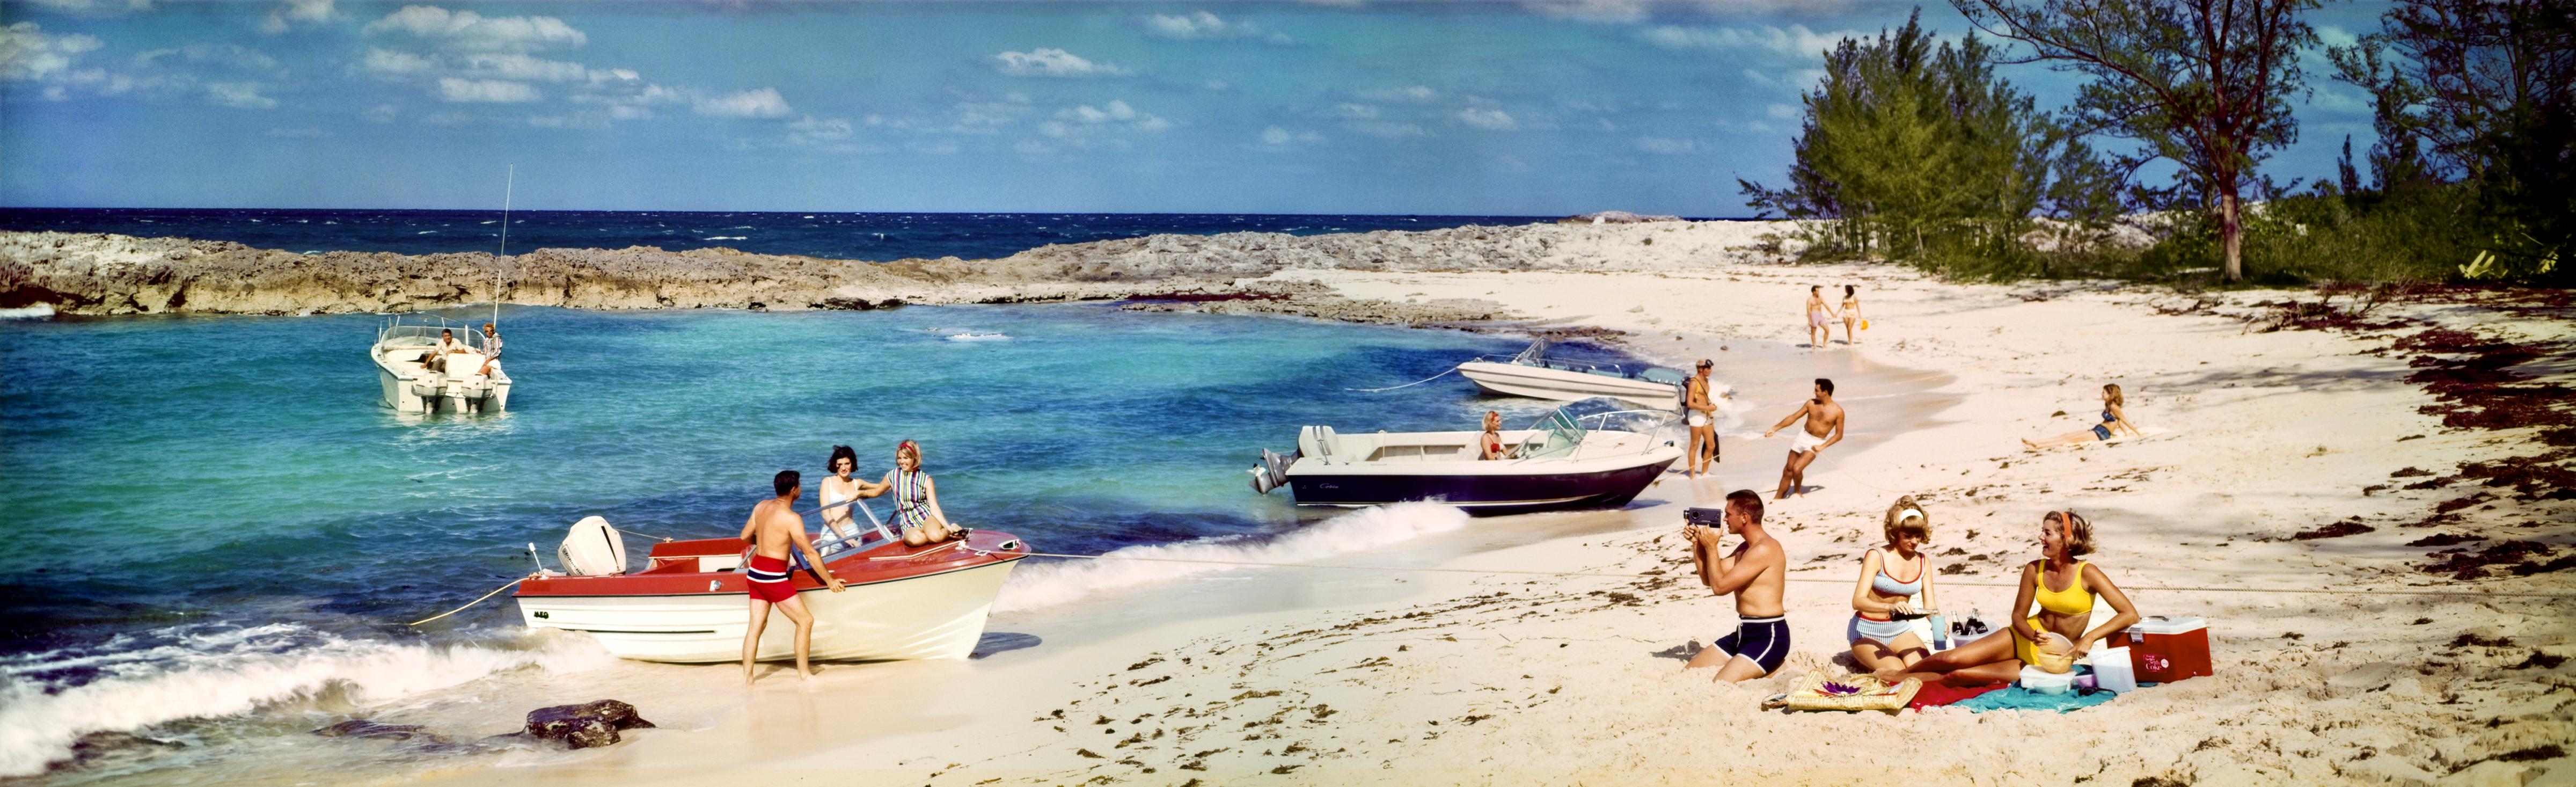 grandcentralterminal_colorama_protofoto15_paradise_island.ru_-1.jpg